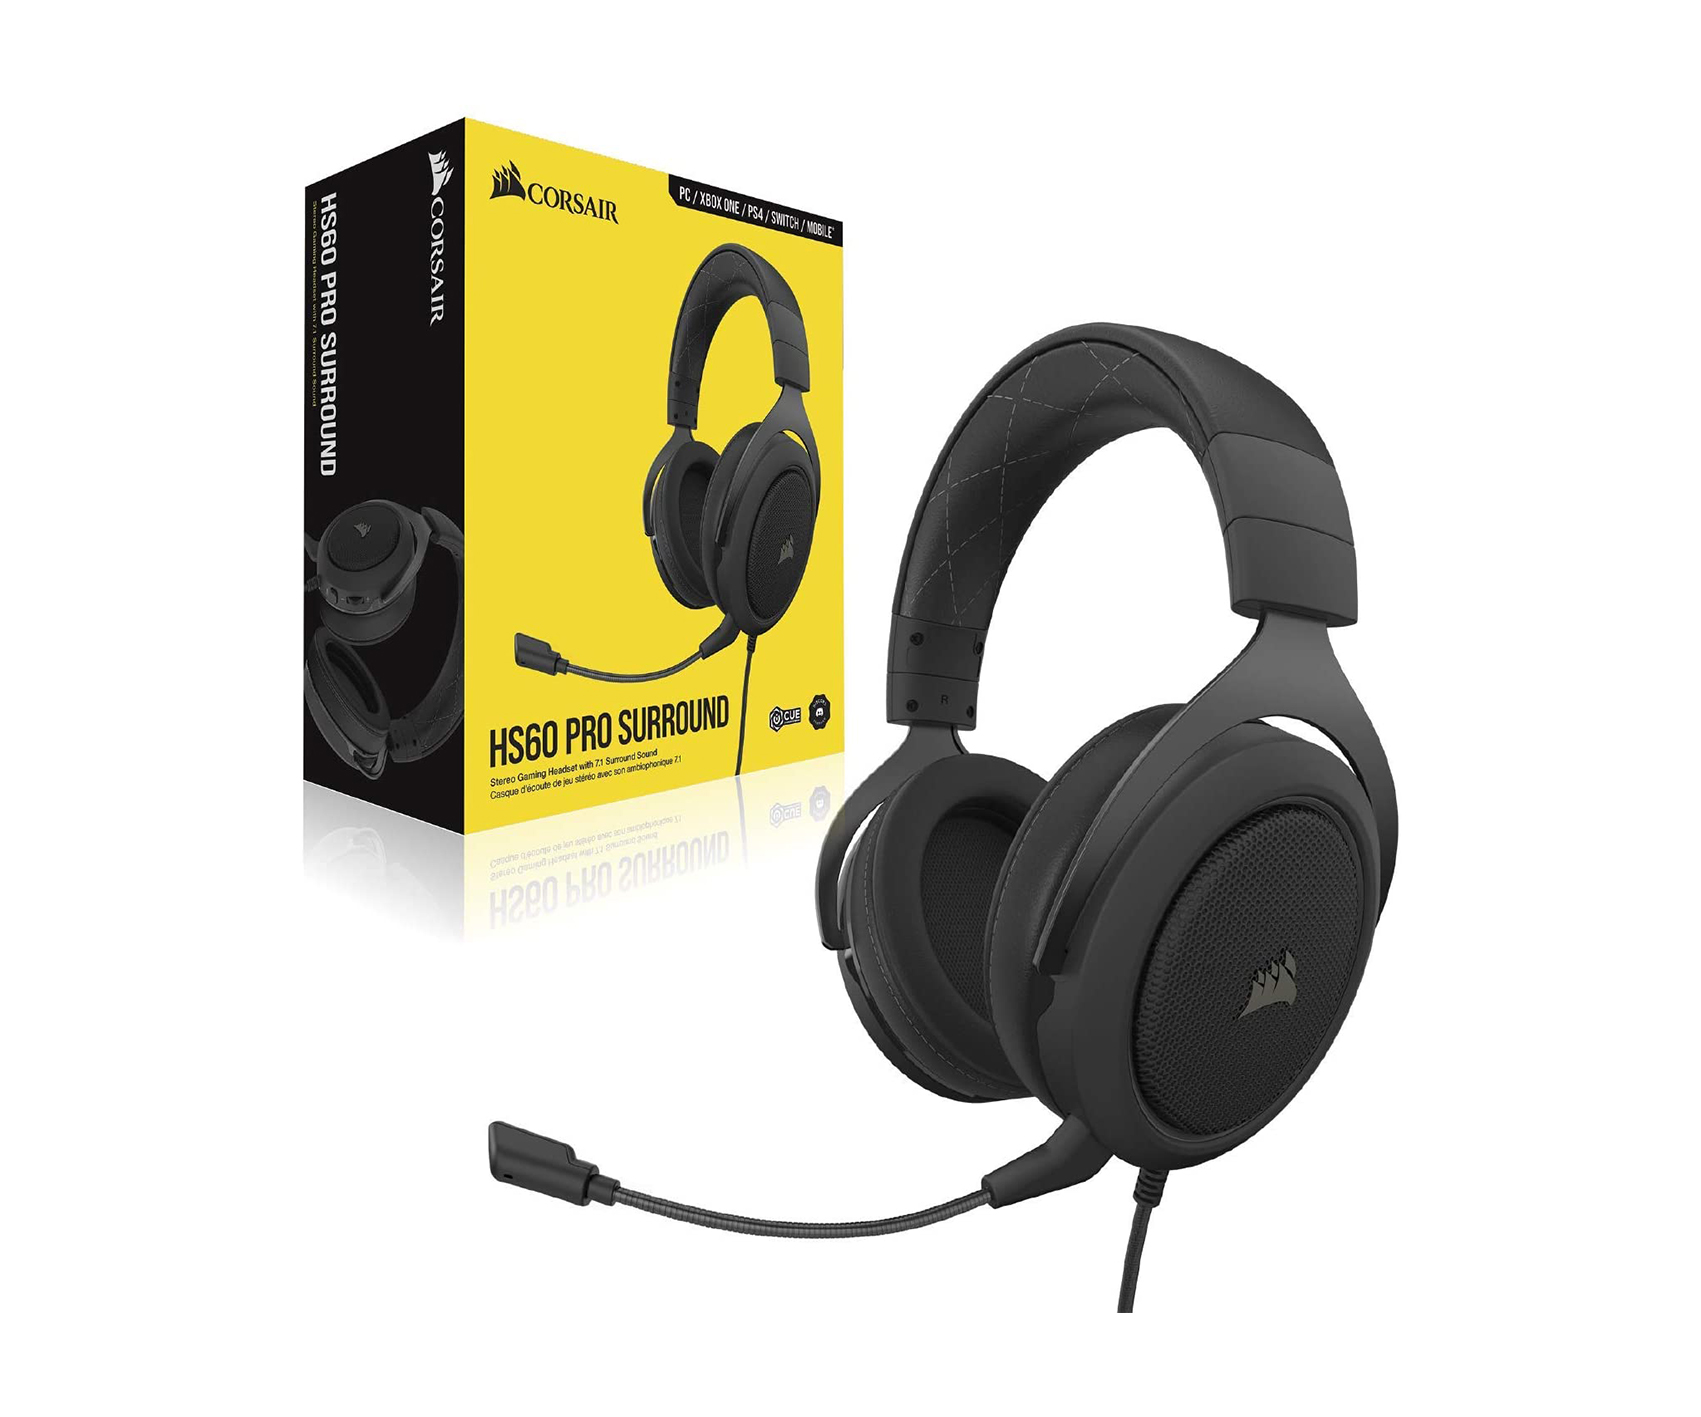 Corsair HS60 PRO SURROUND 7.1 Gaming Headset — Carbon